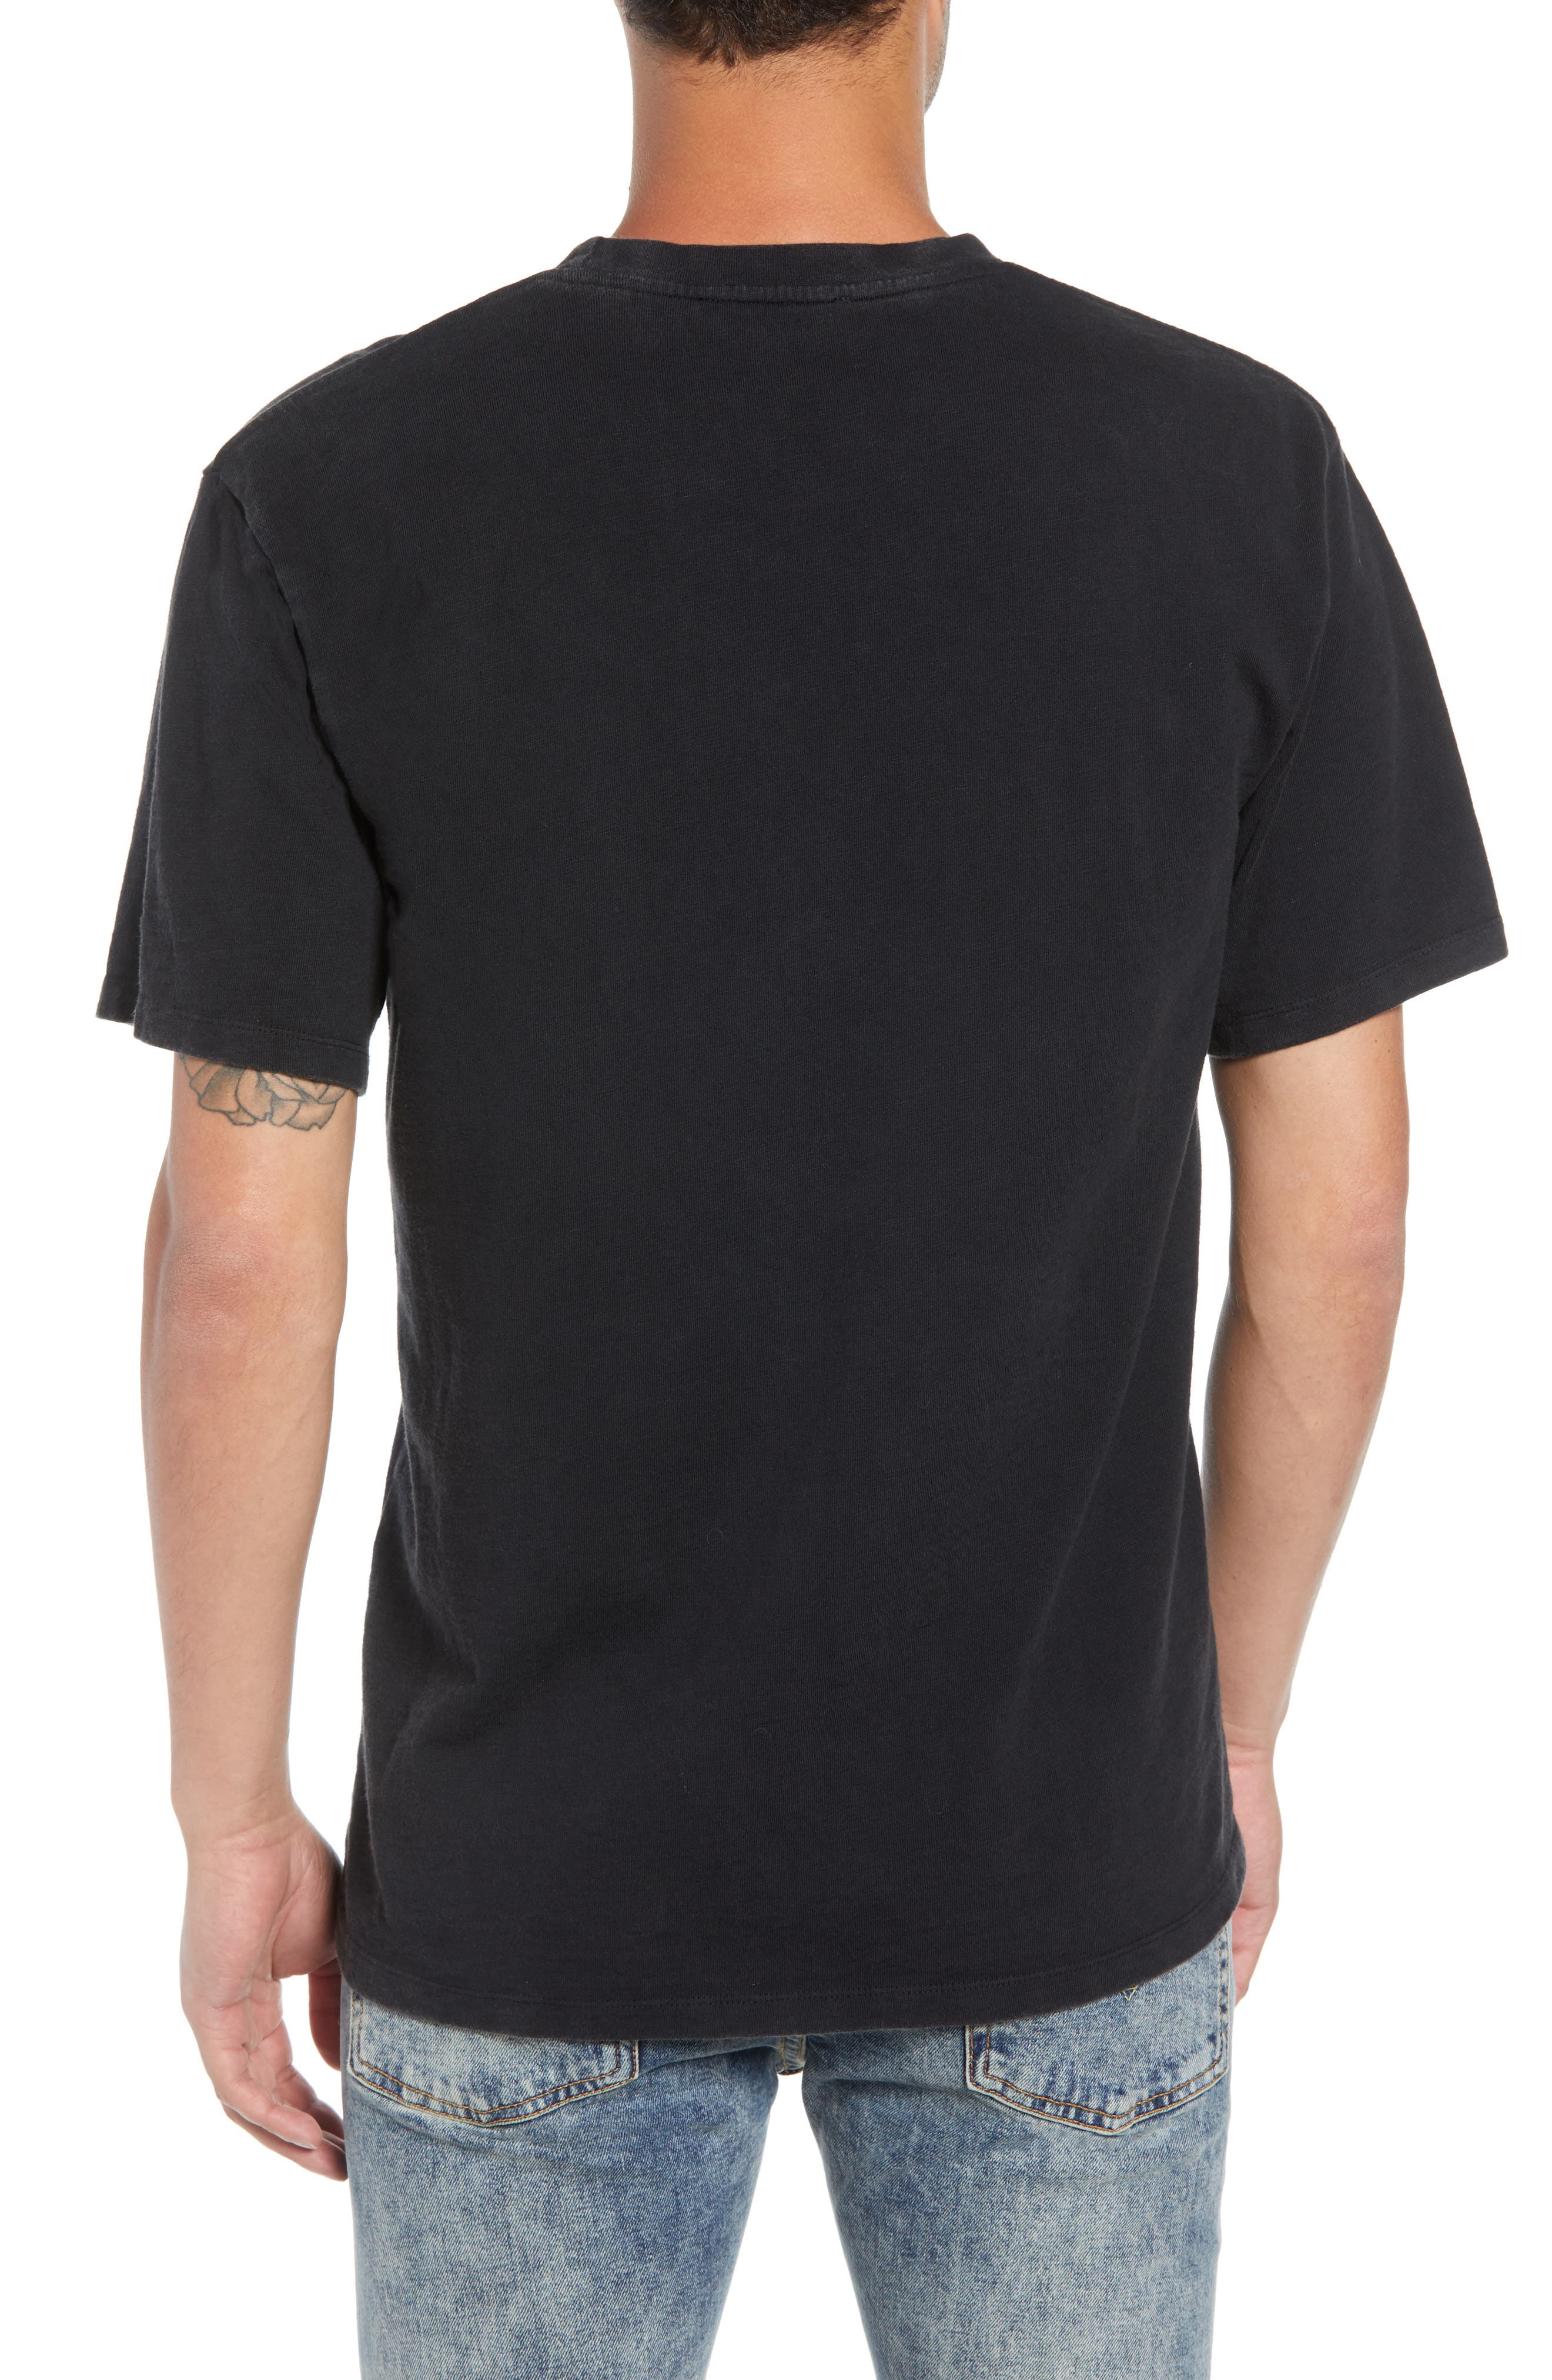 Murphy's Law Graphic T-Shirt,                             Alternate thumbnail 2, color,                             BLACK